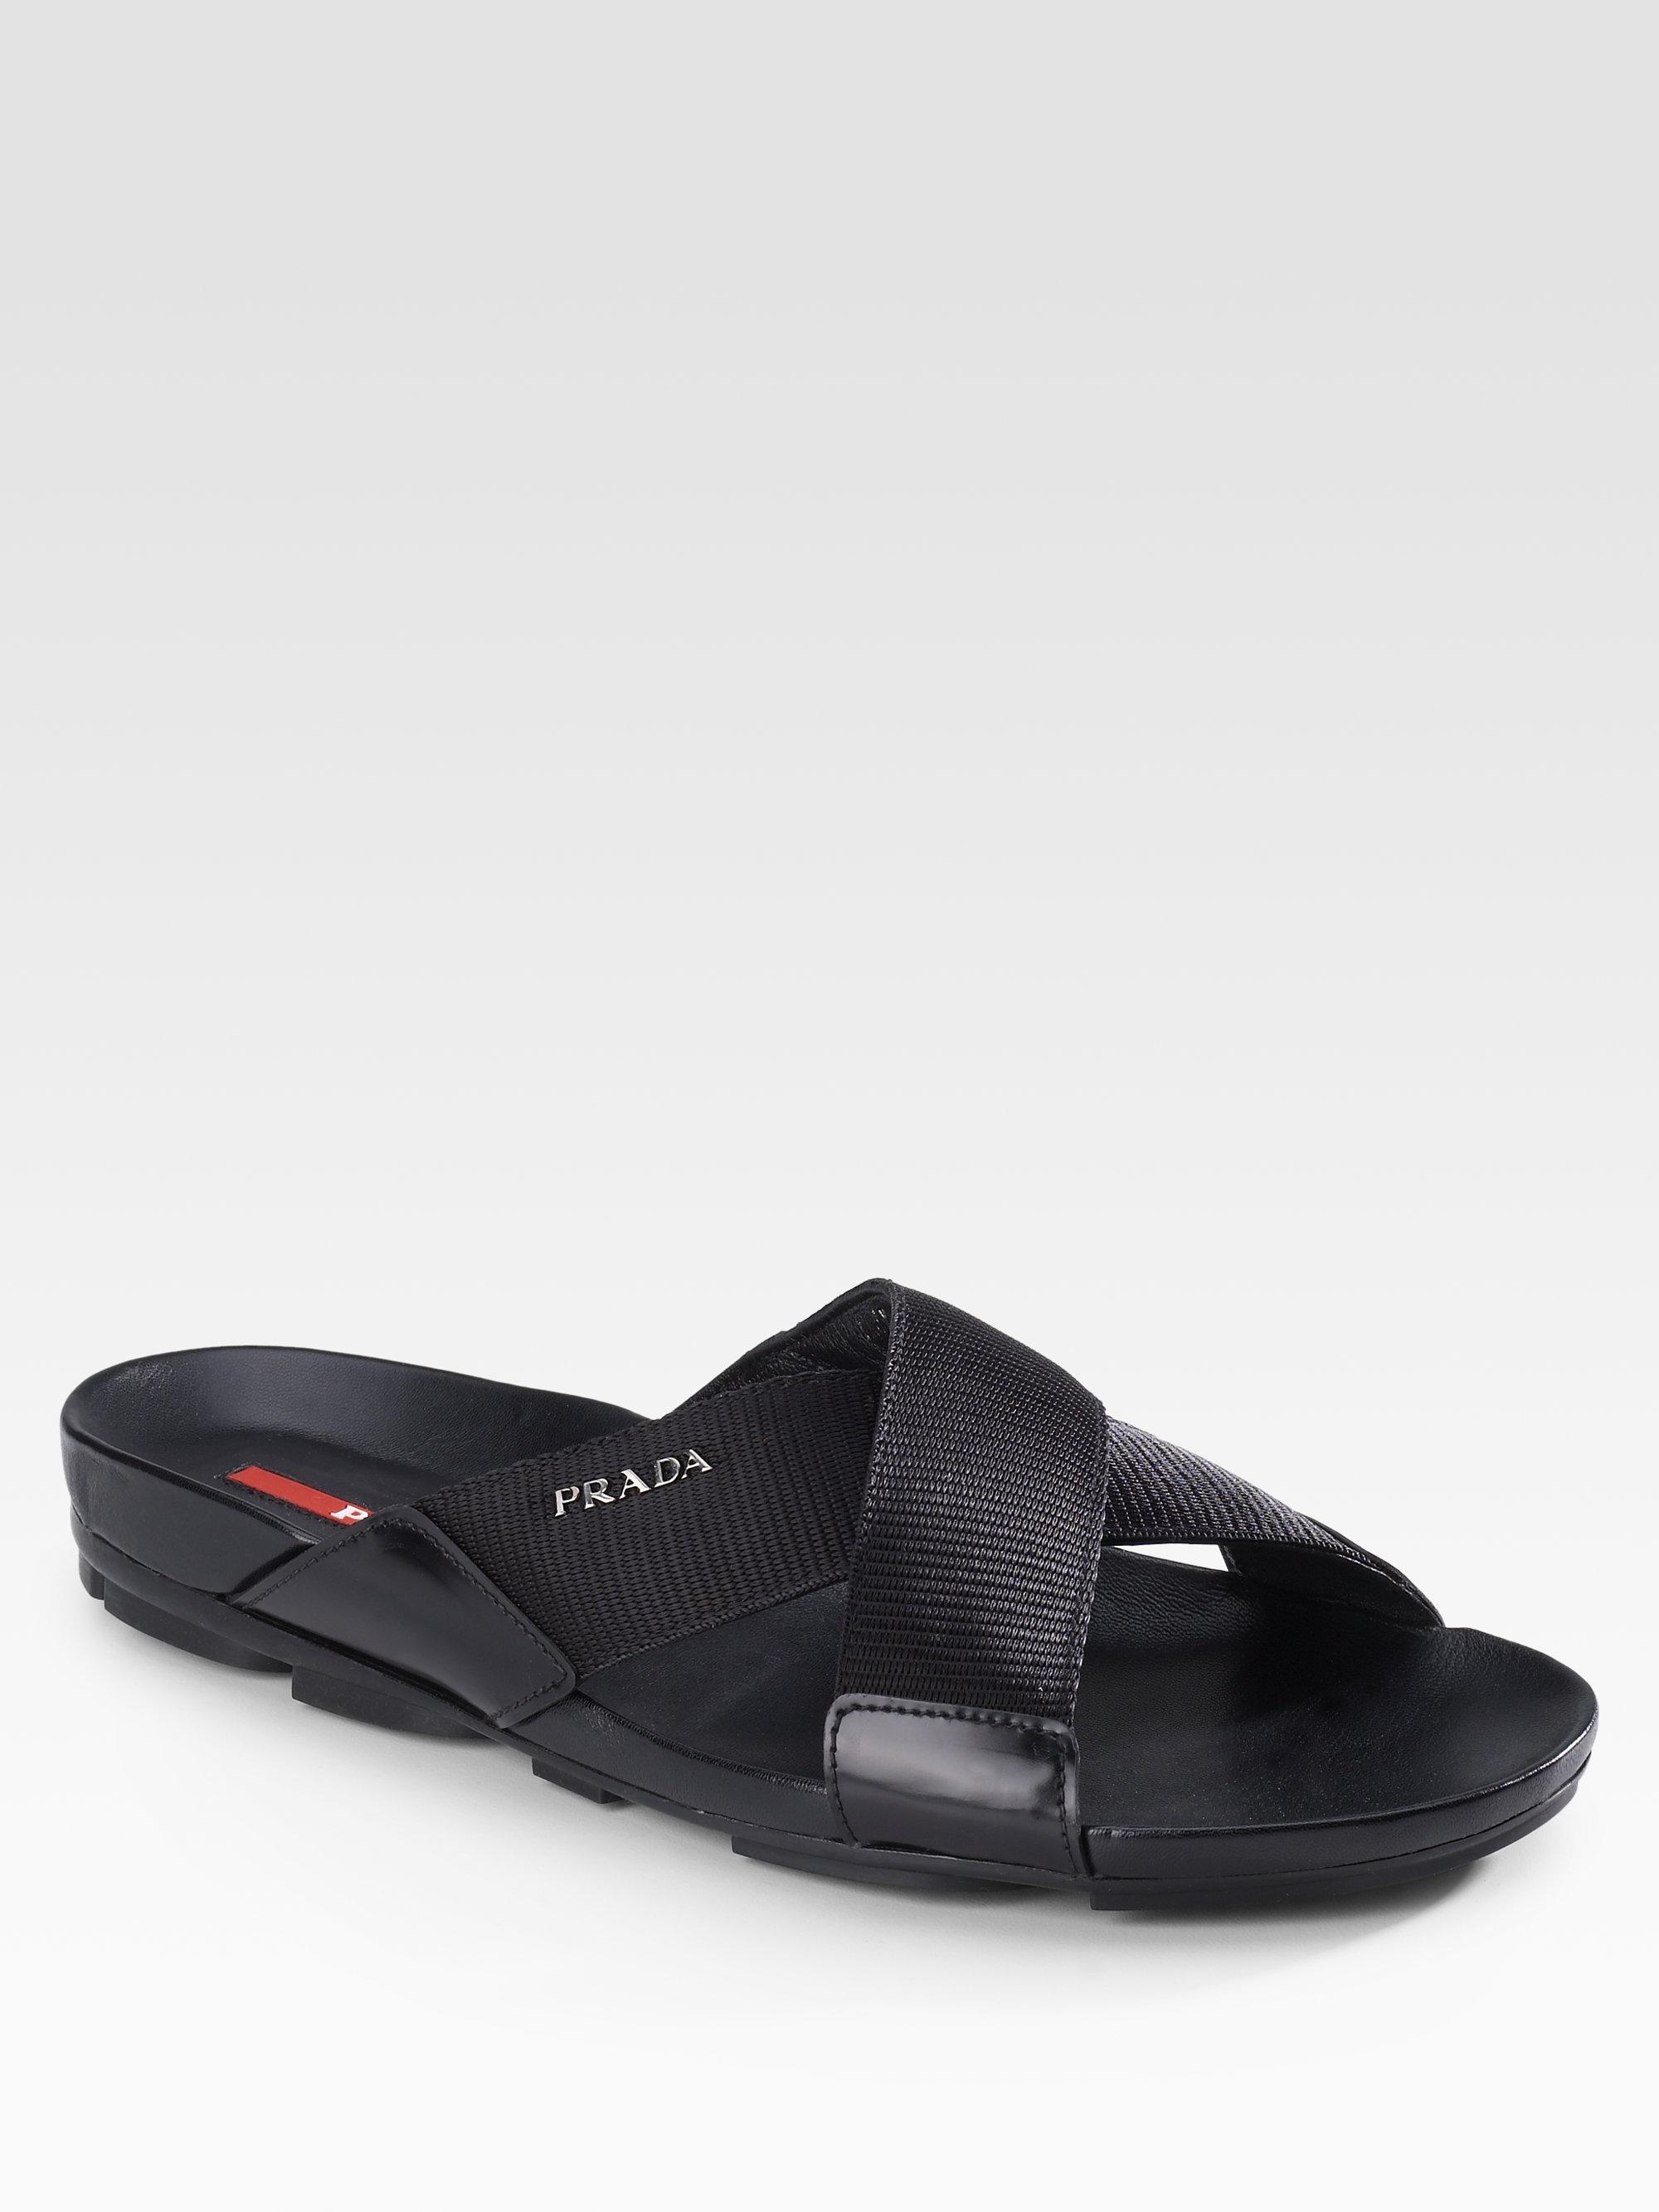 ffe0e24bccb3 Lyst - Prada Leather Sandals in Black for Men